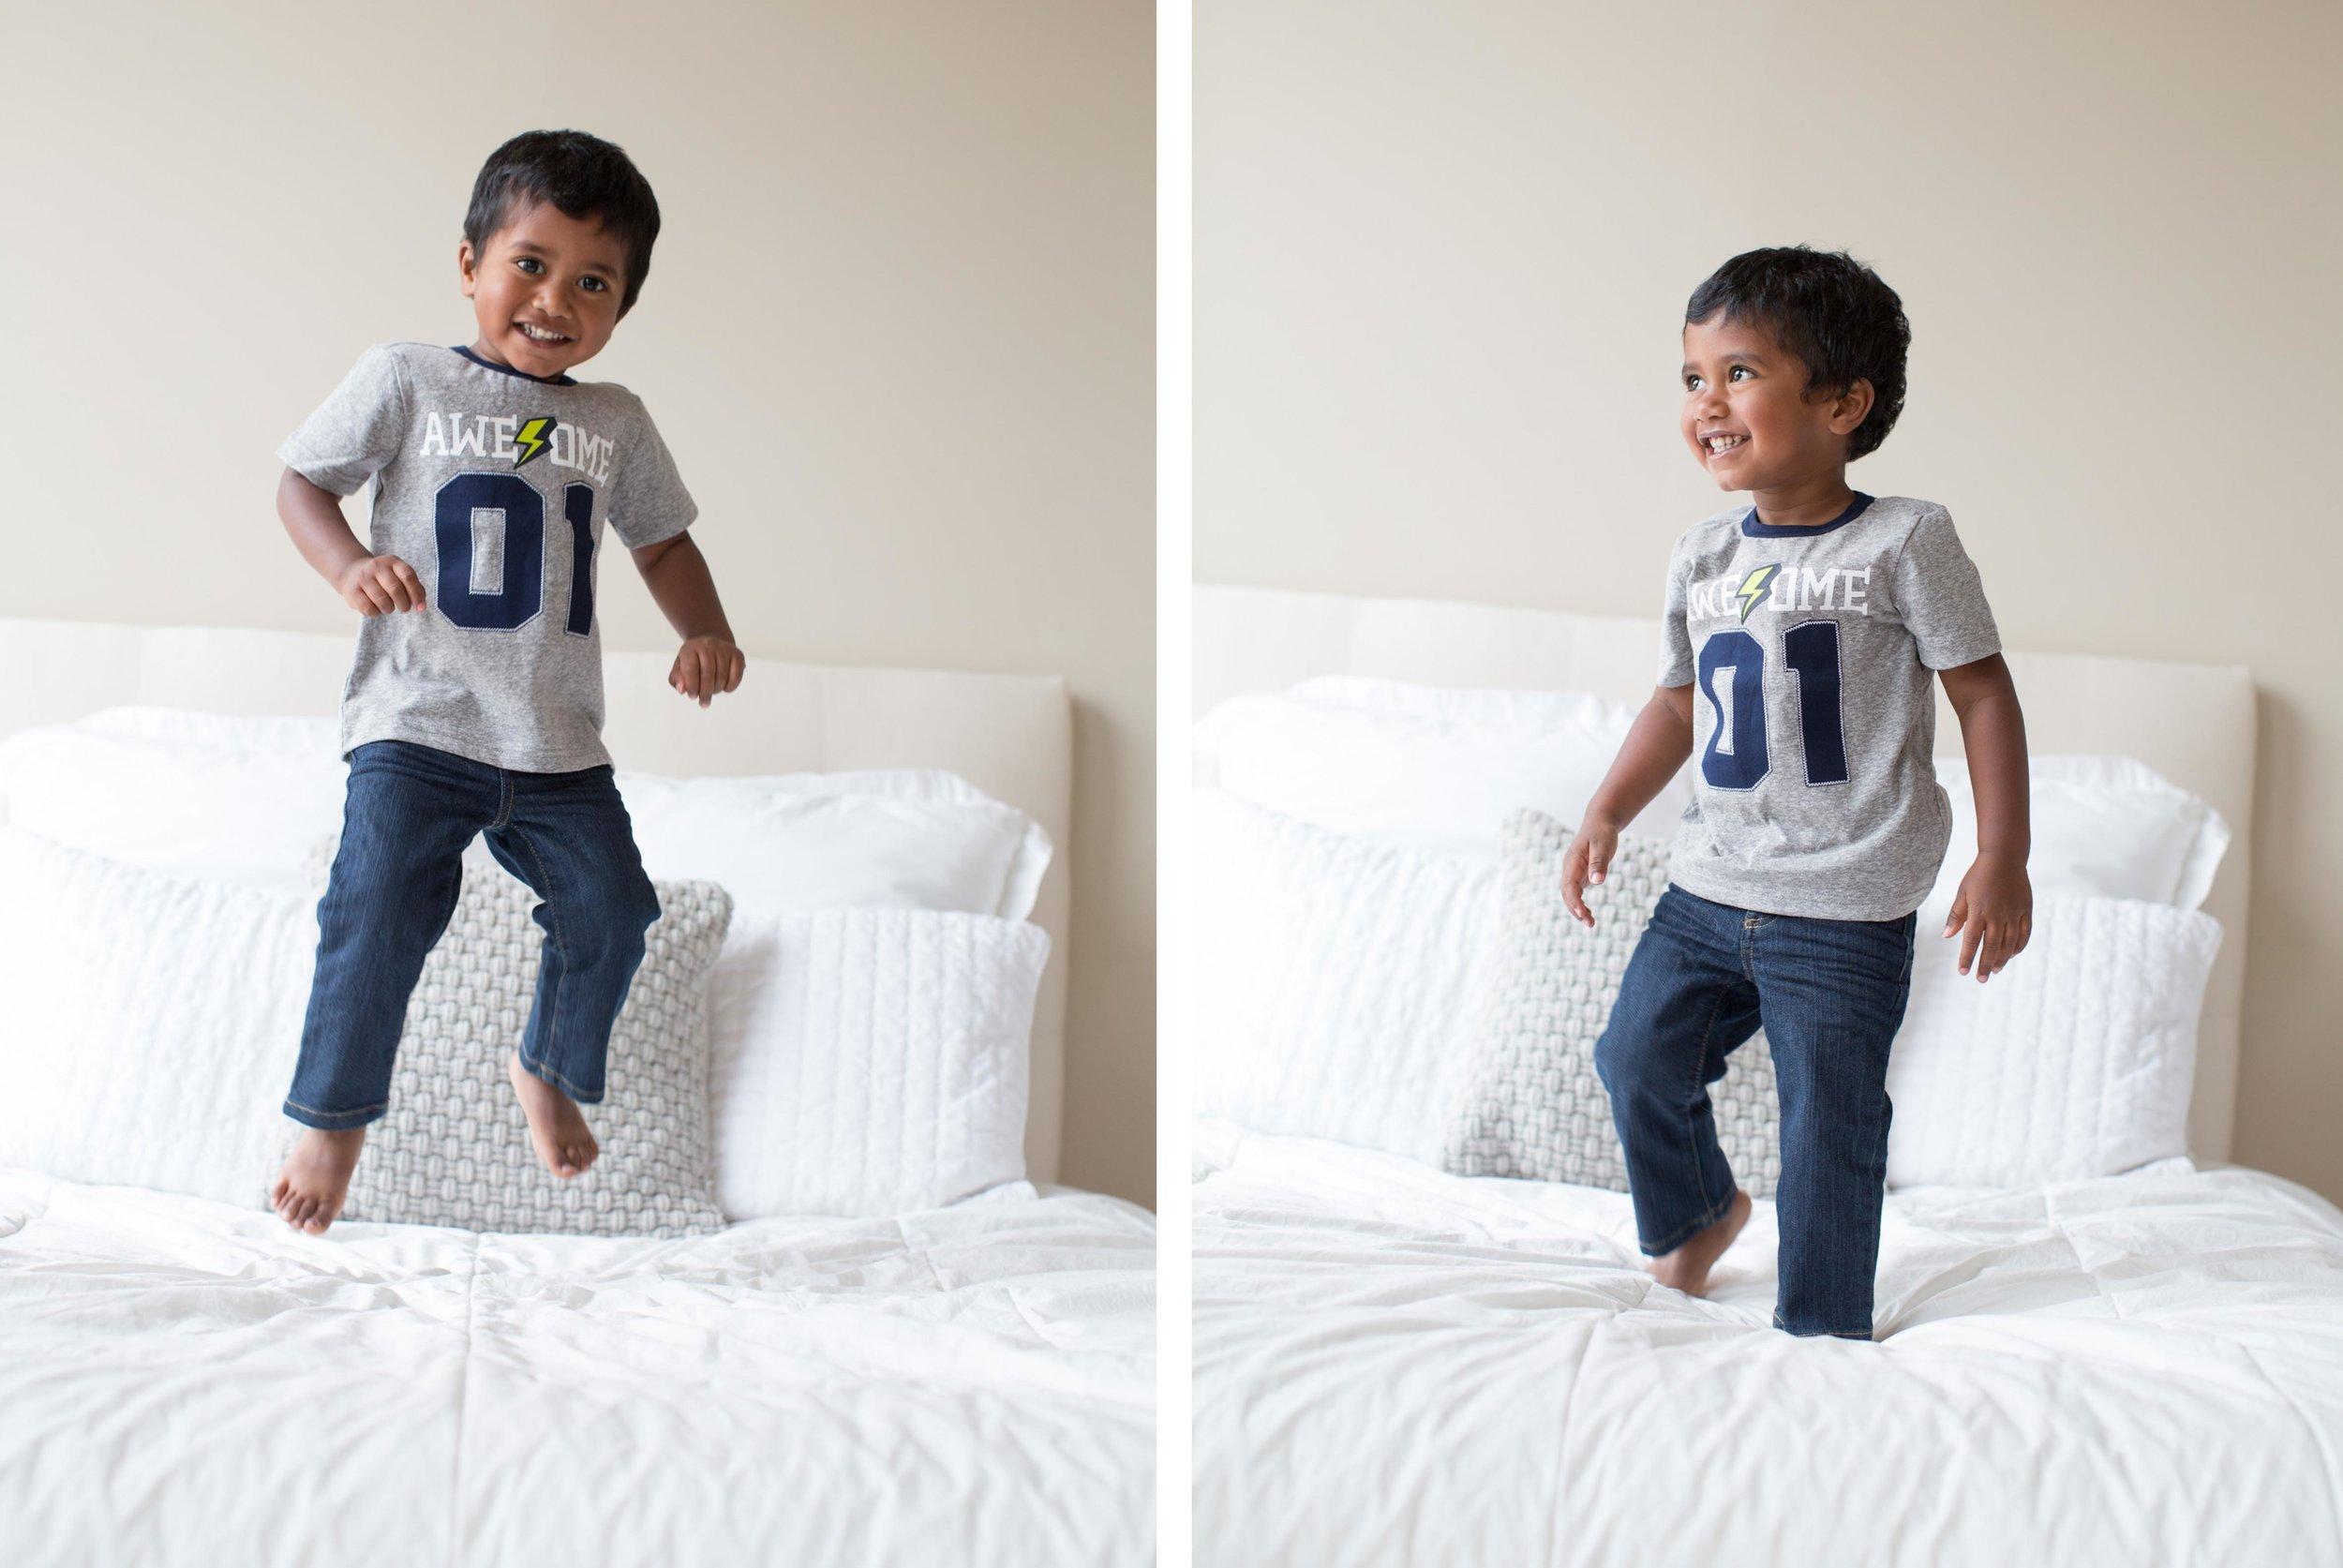 Sweet_boy_jumping_on_bed.jpg